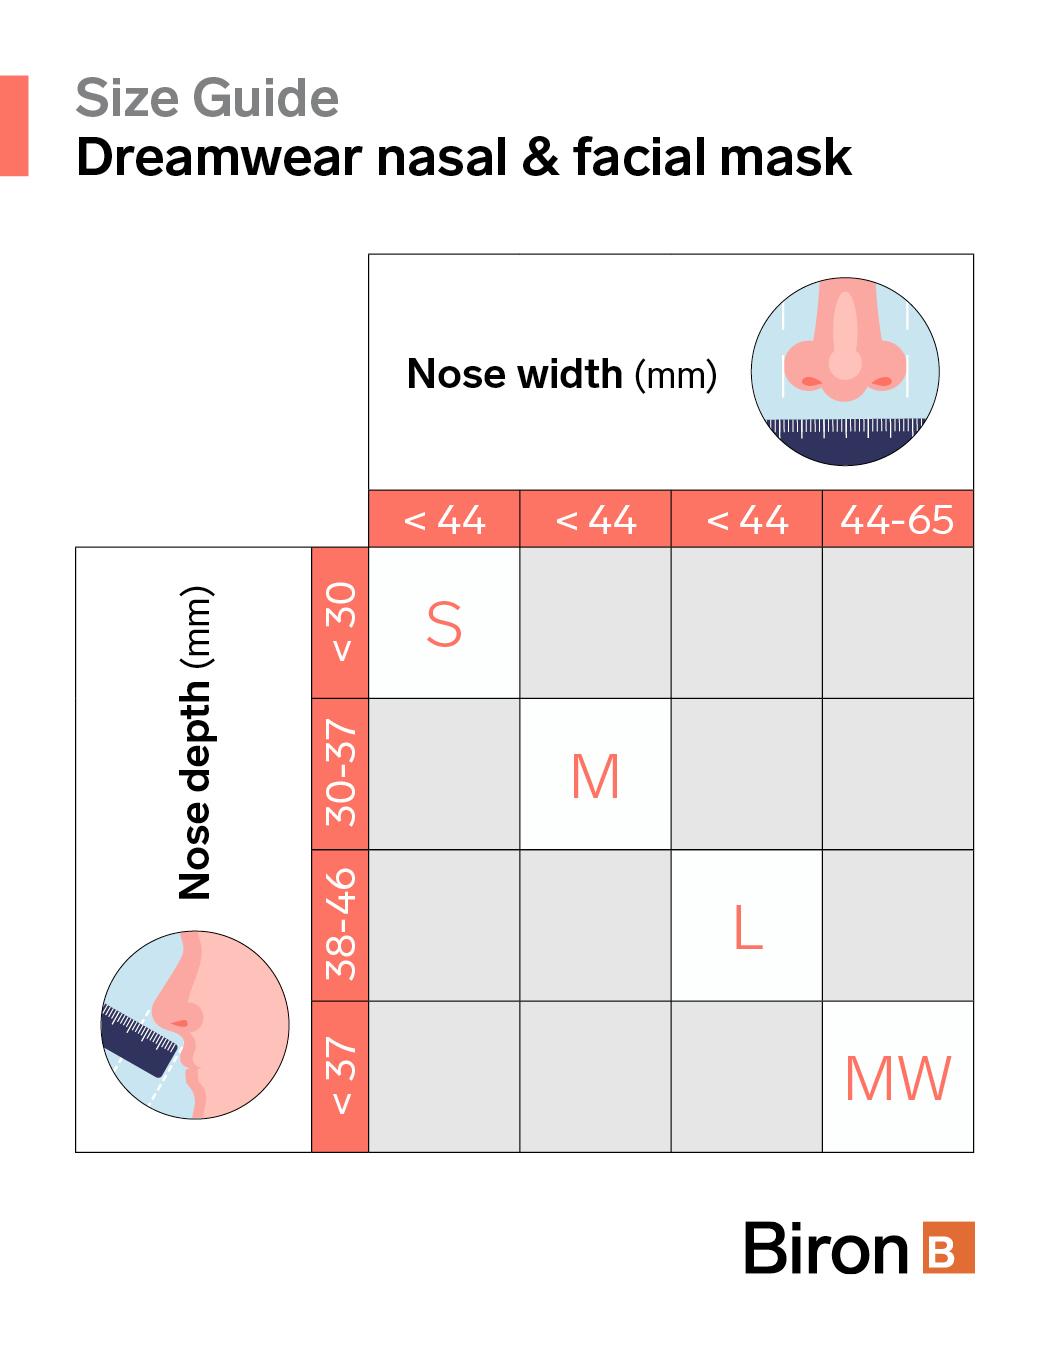 Image de Masque nasal DreamWear avec harnais amélioré (Fitpack)